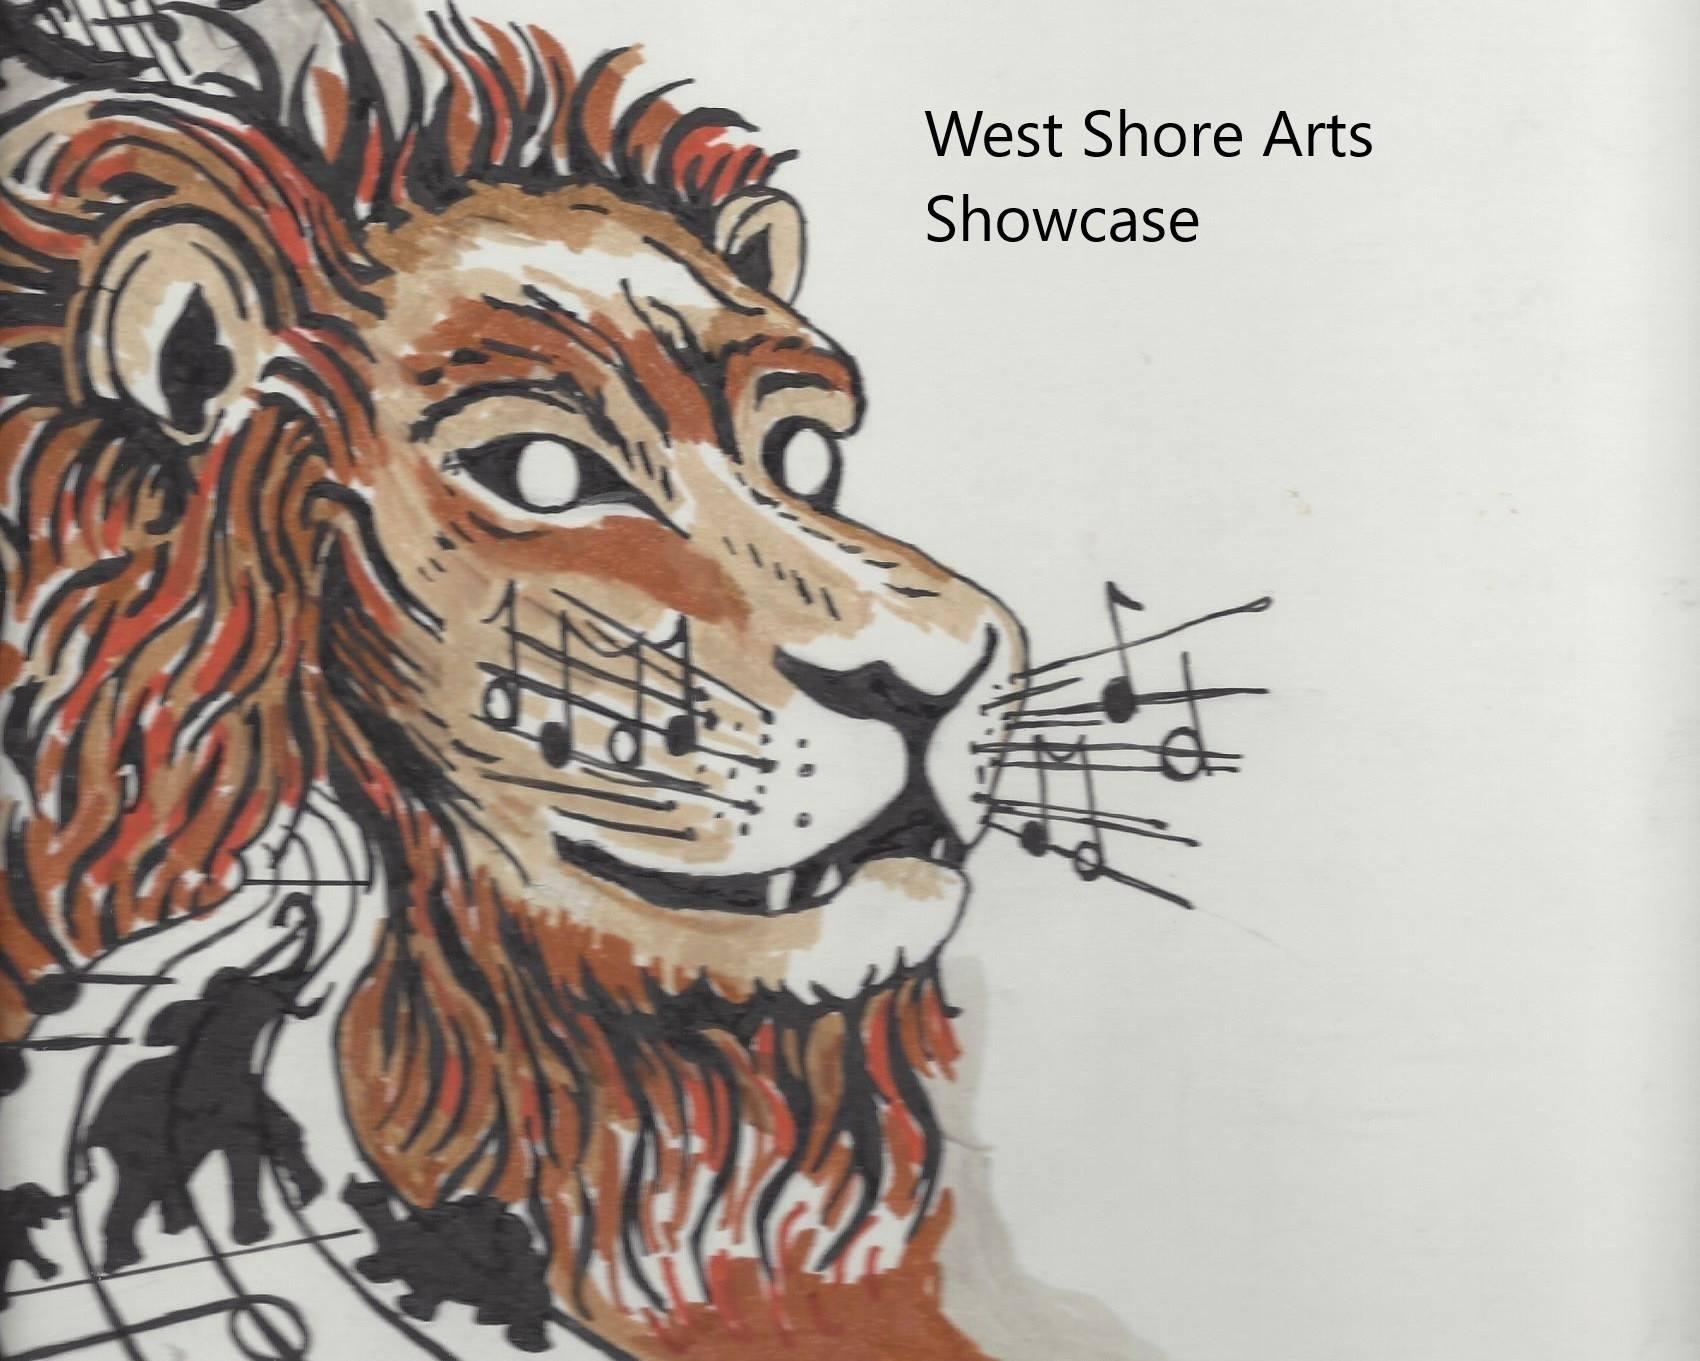 West Shore Arts Showcase